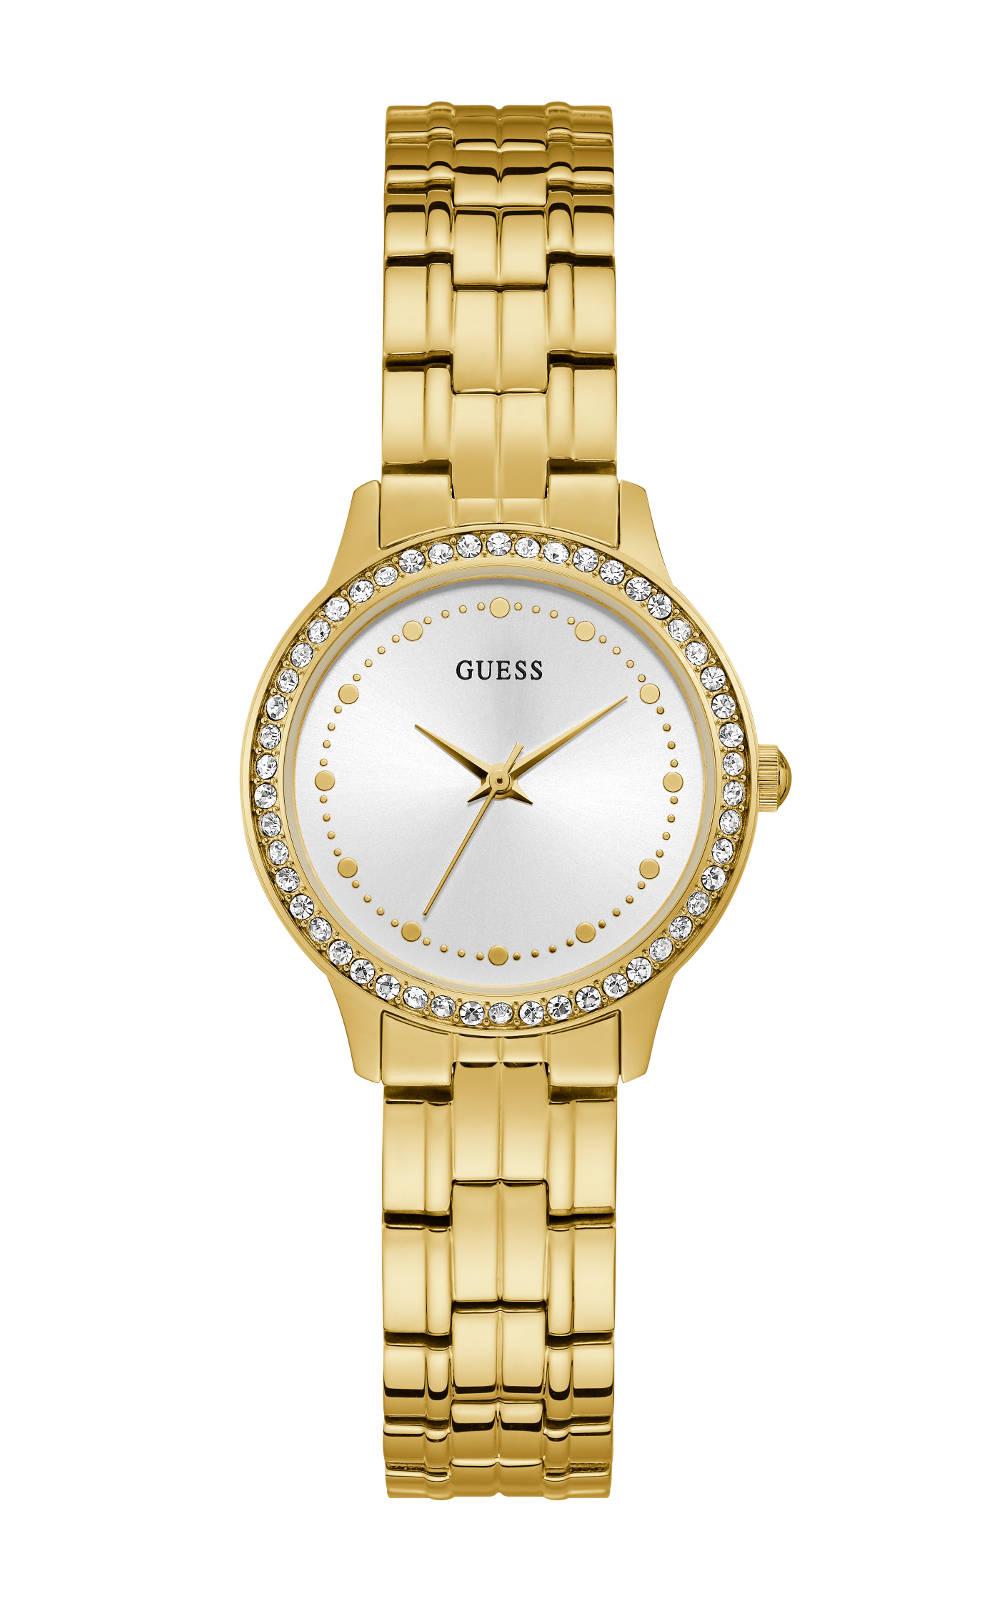 GUESS W1209L2 Γυναικείο Ρολόι Quartz Ακριβείας 8b9e59bebe1